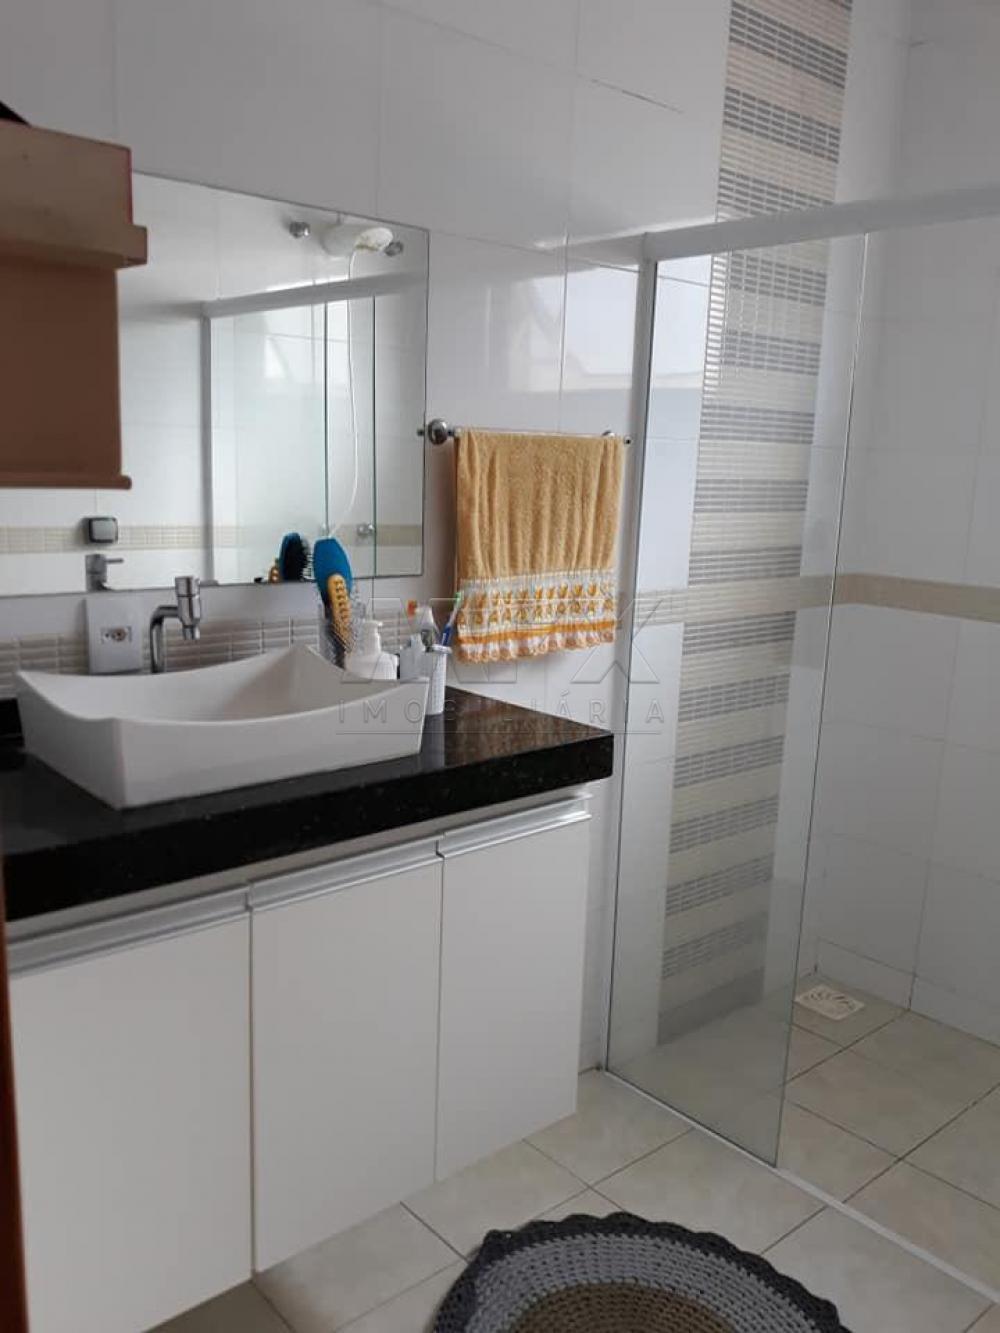 Comprar Casa / Condomínio em Bauru apenas R$ 750.000,00 - Foto 9